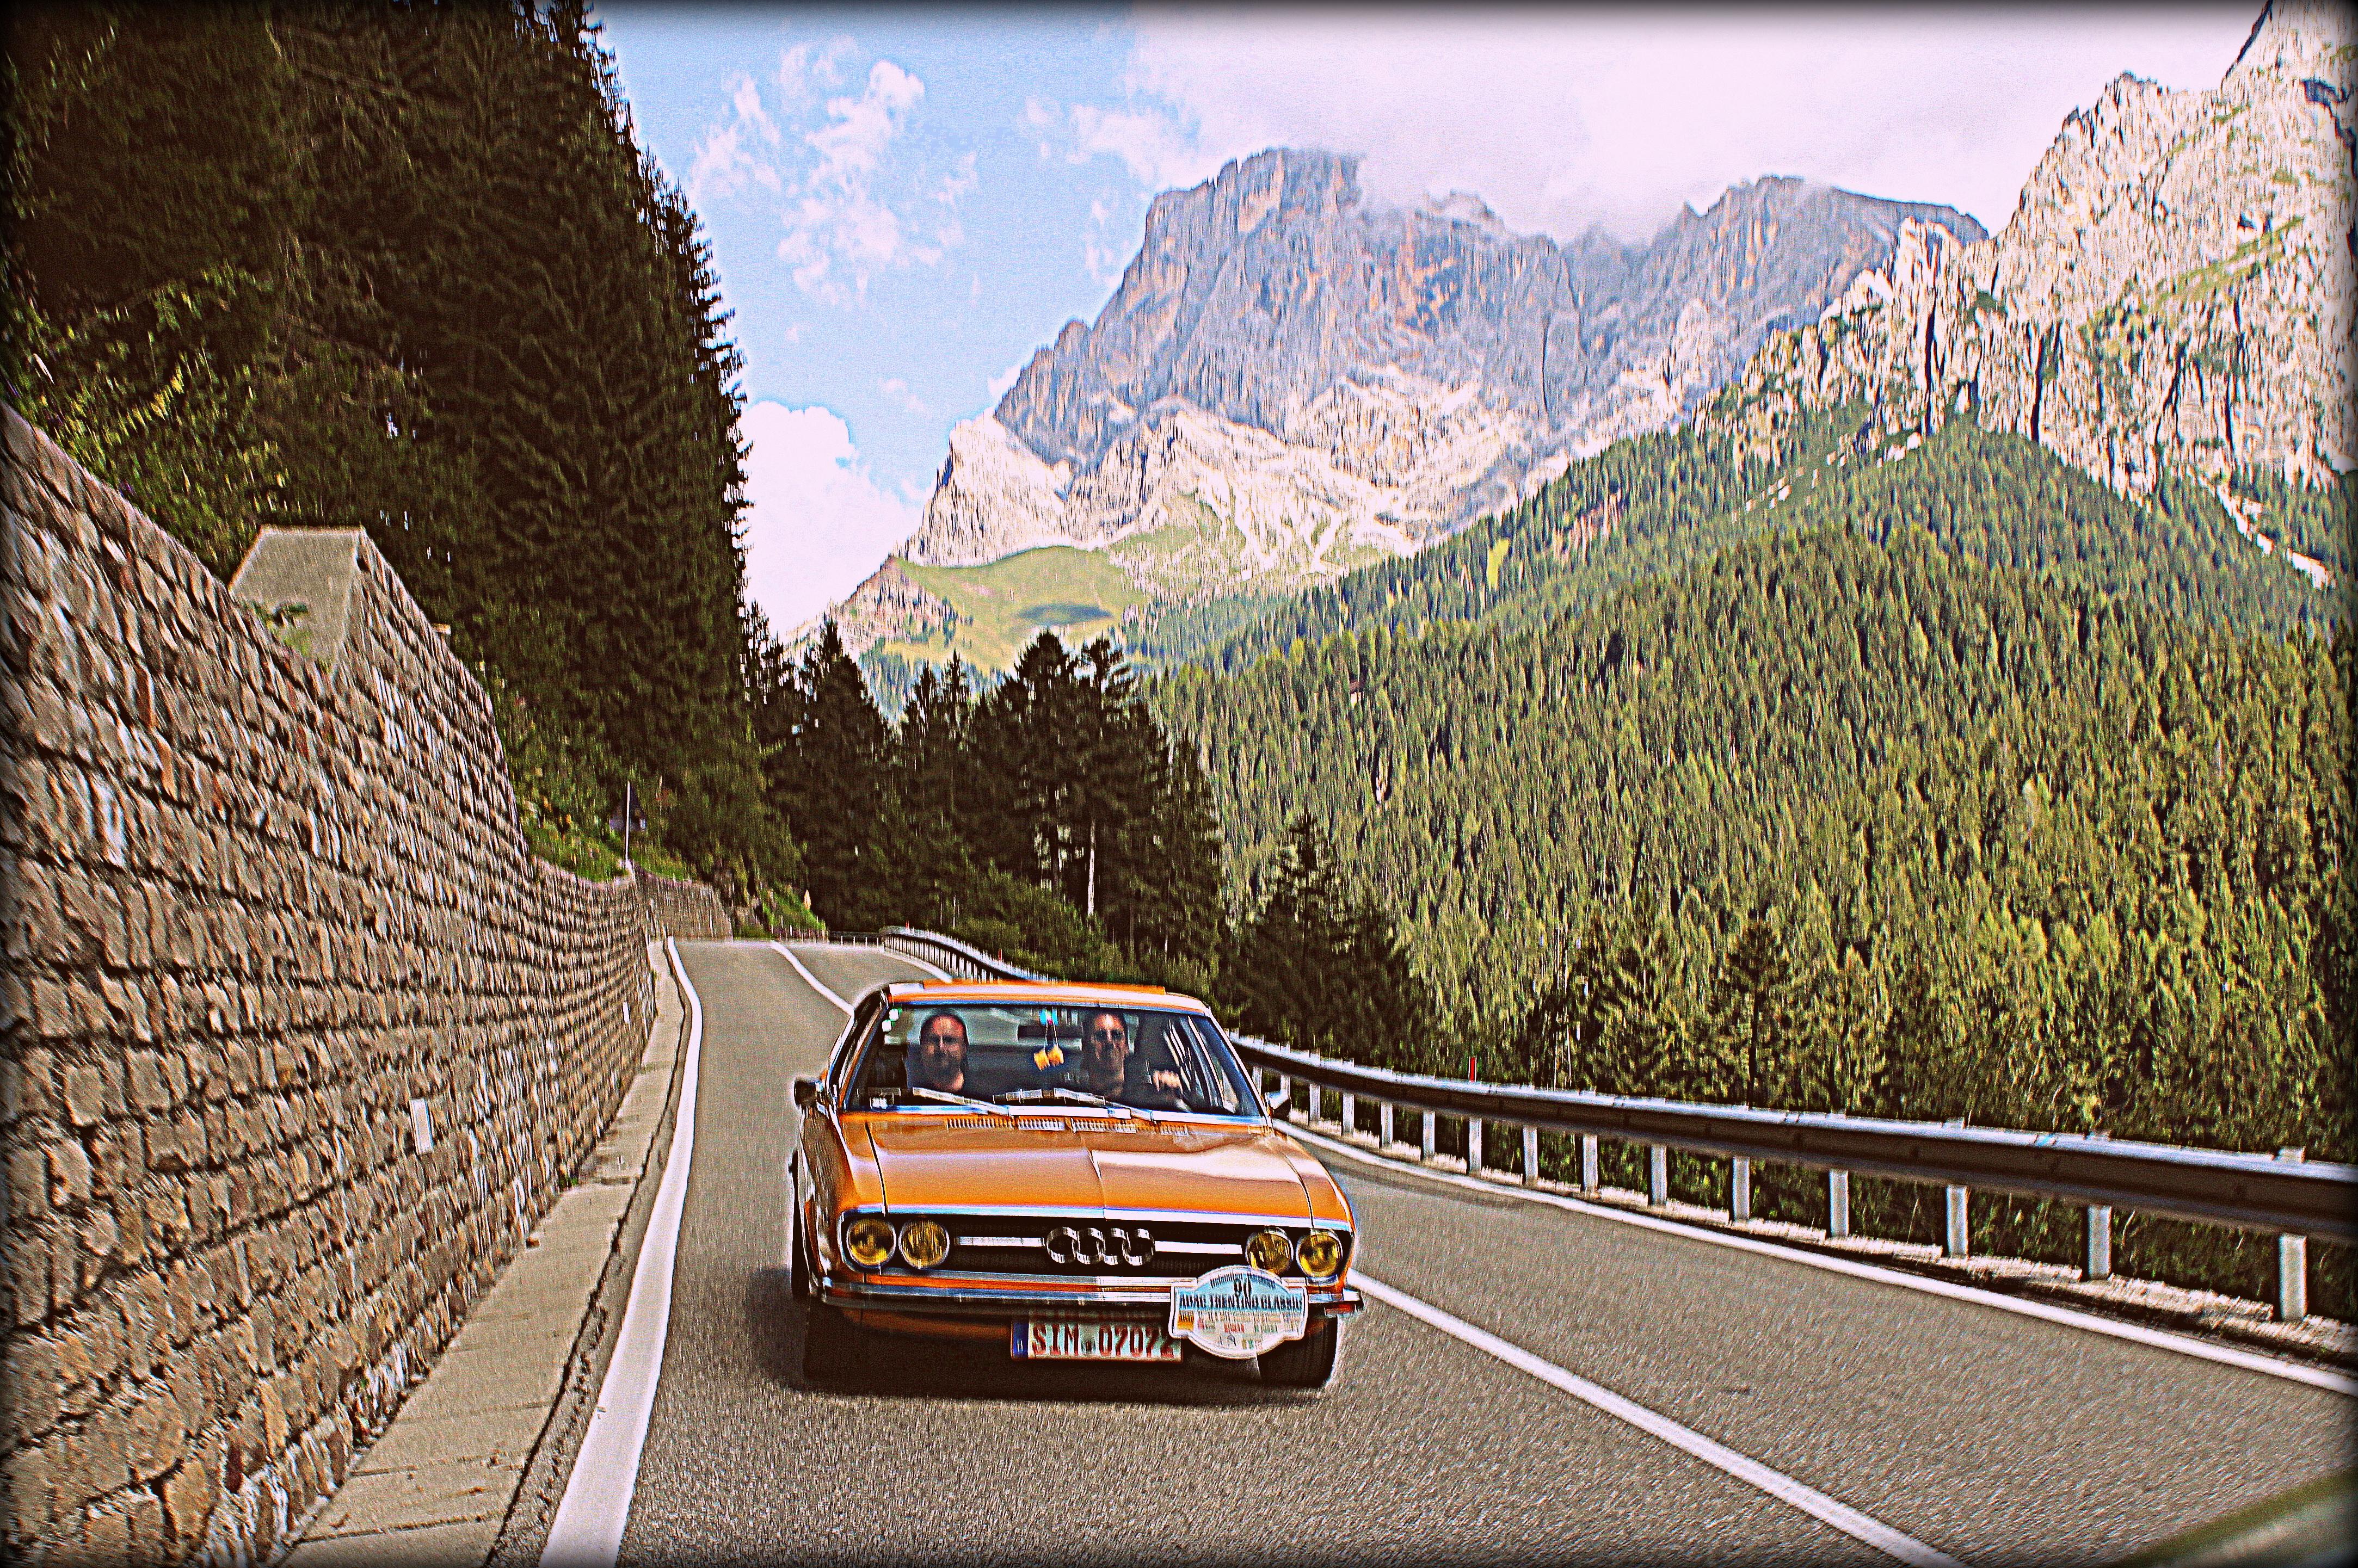 190 Etappenkilometer durch die Dolomiten zum Lago di Caldonazzo